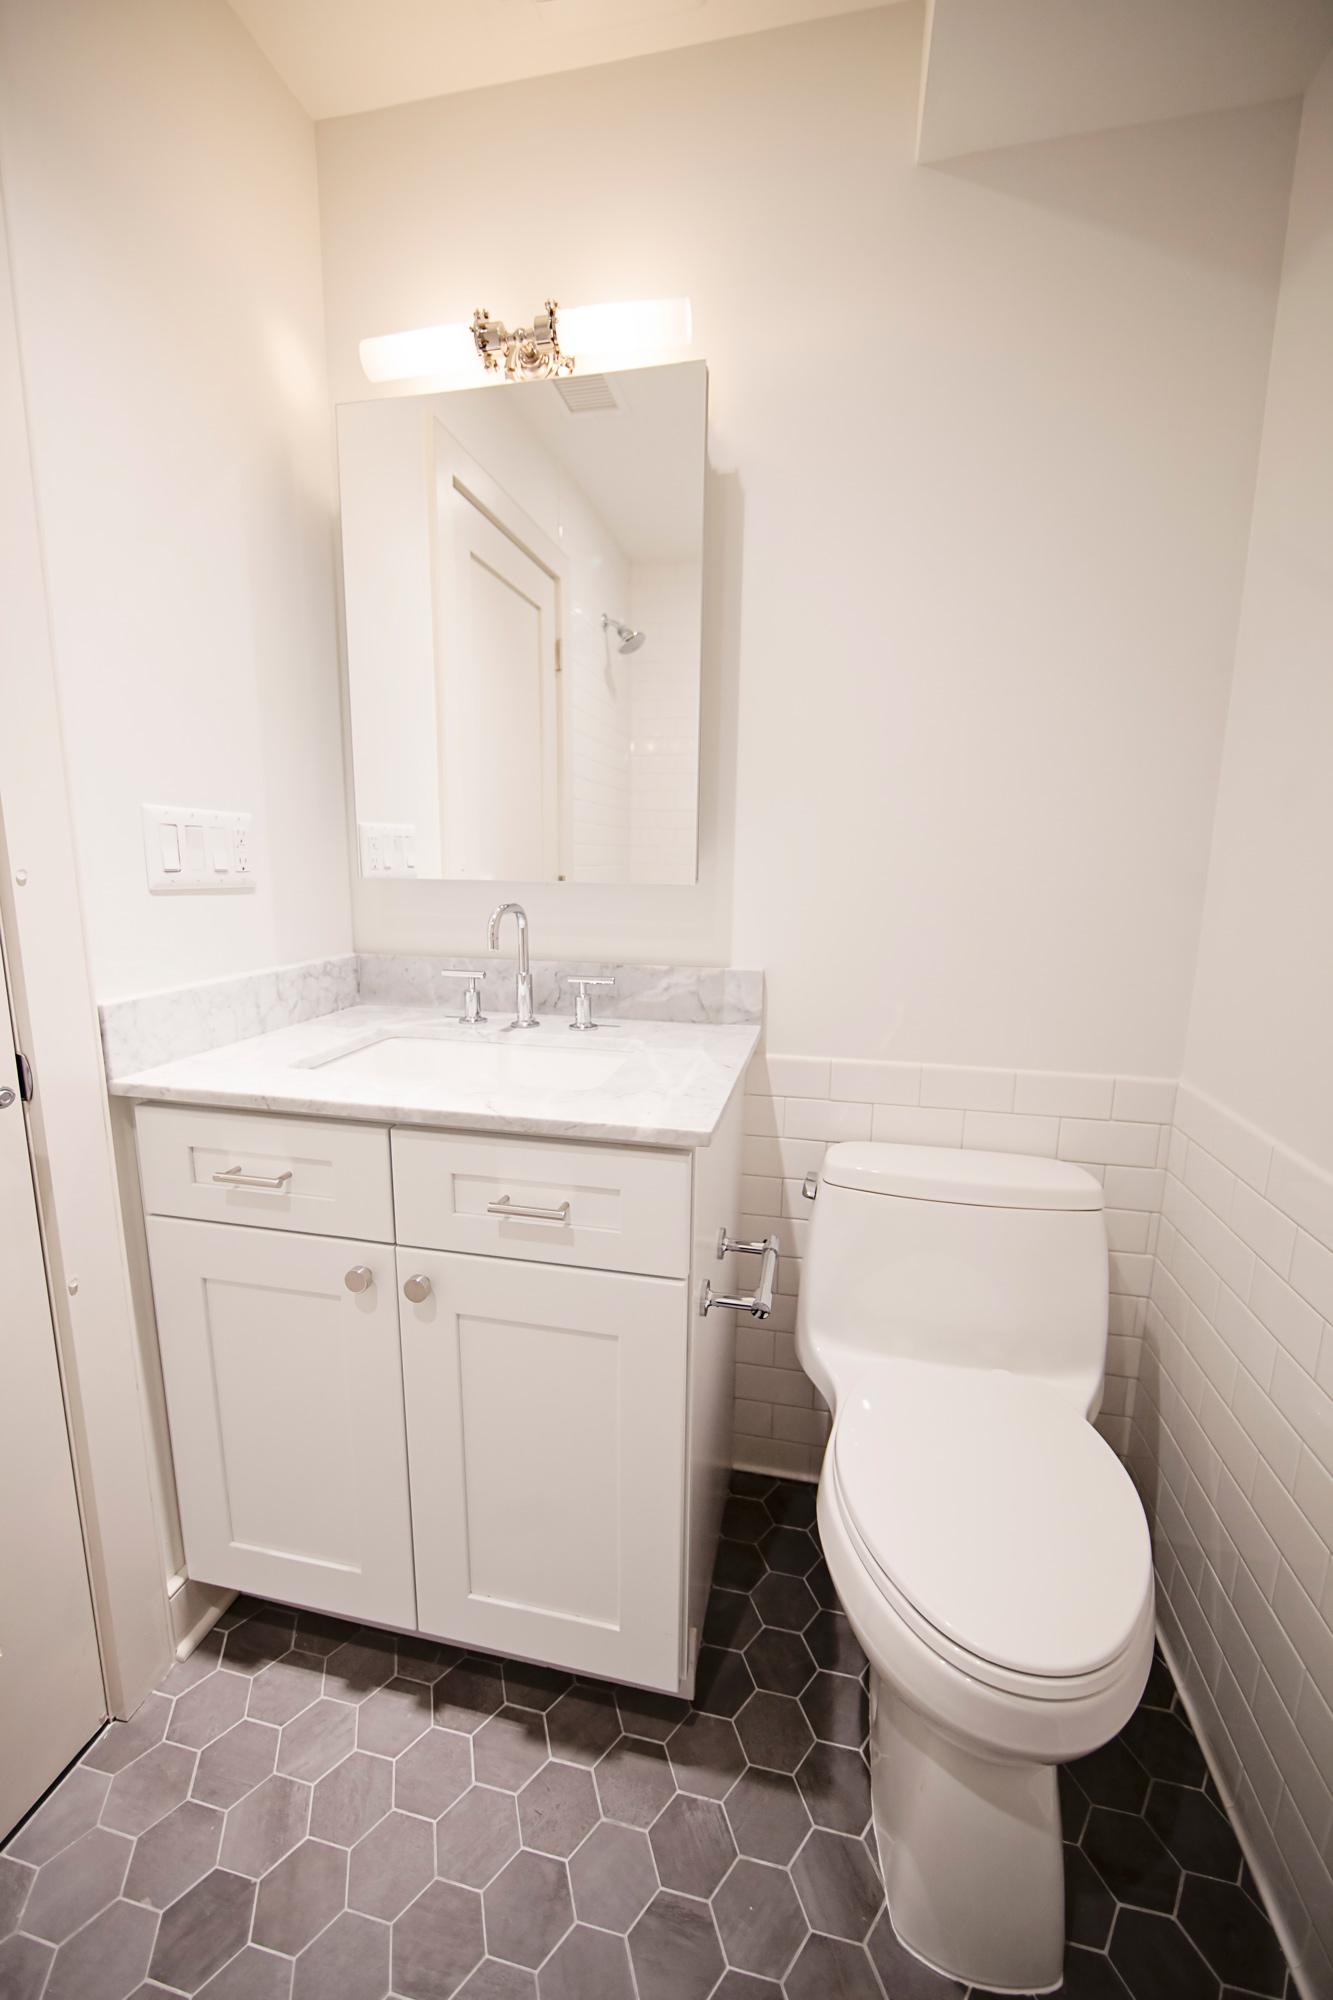 thompson-fine-home-renovations-hoboken-new-jersey-construction-10.jpg